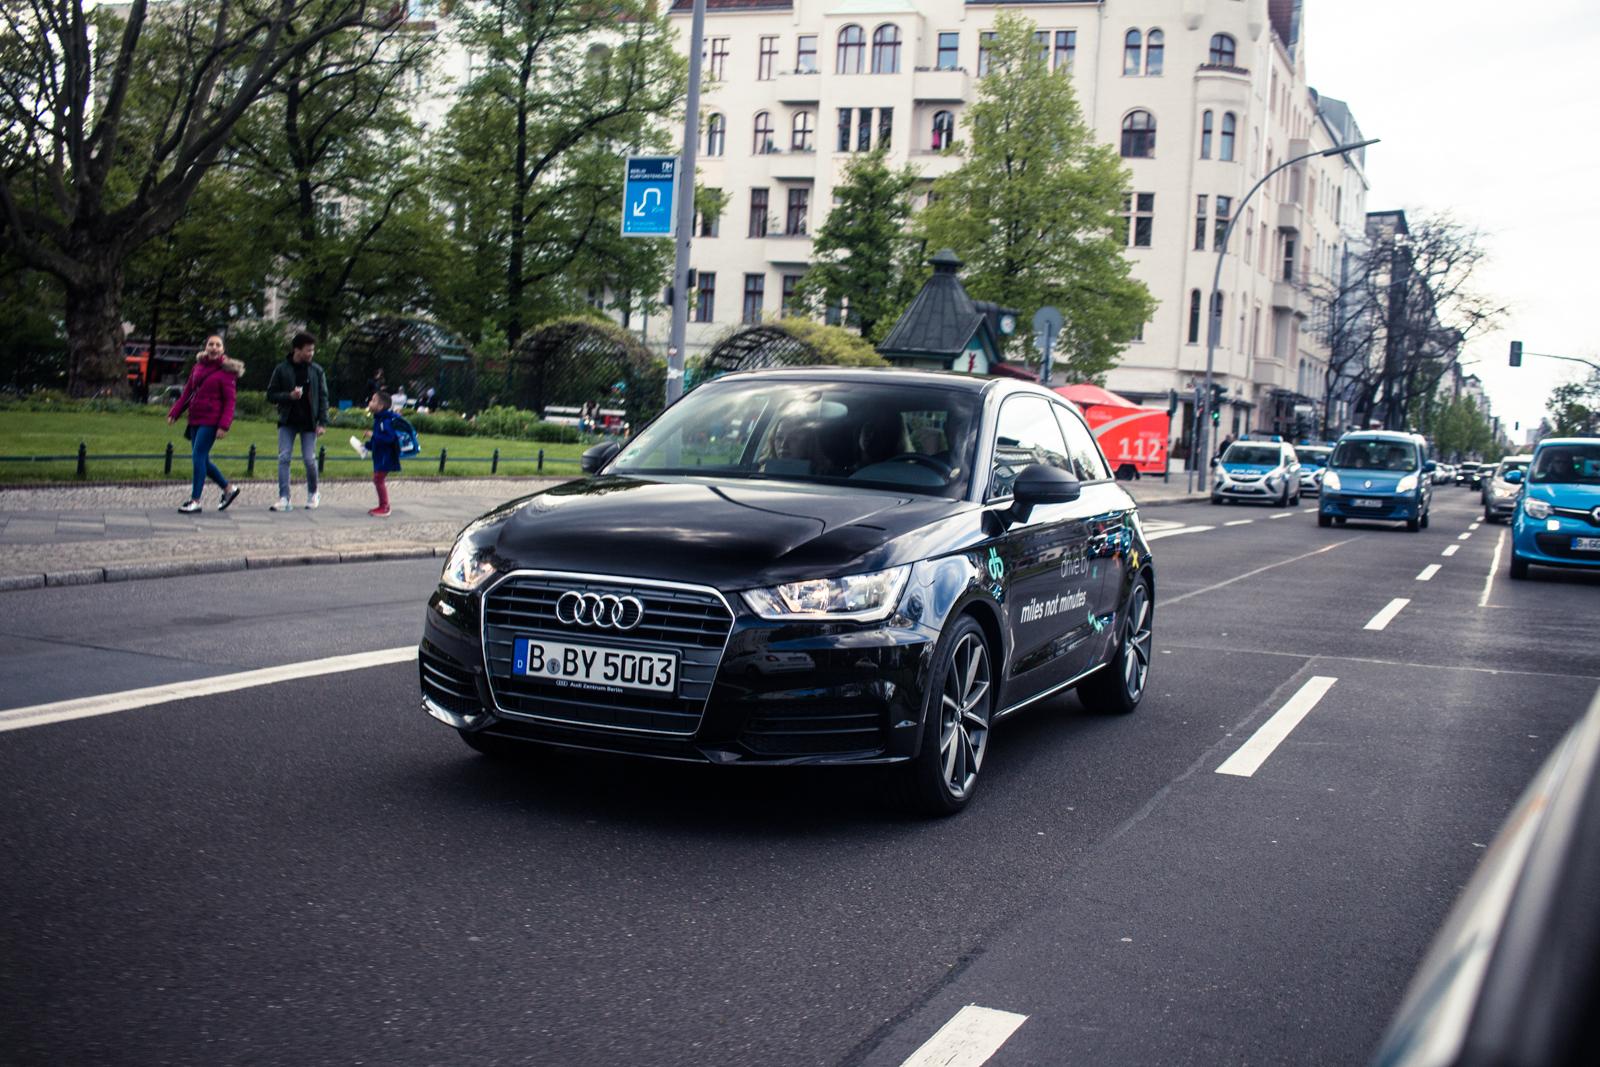 Carsharing von Audi 0€ Anmeldegebühr+ 15 Freikilometer in Berlin